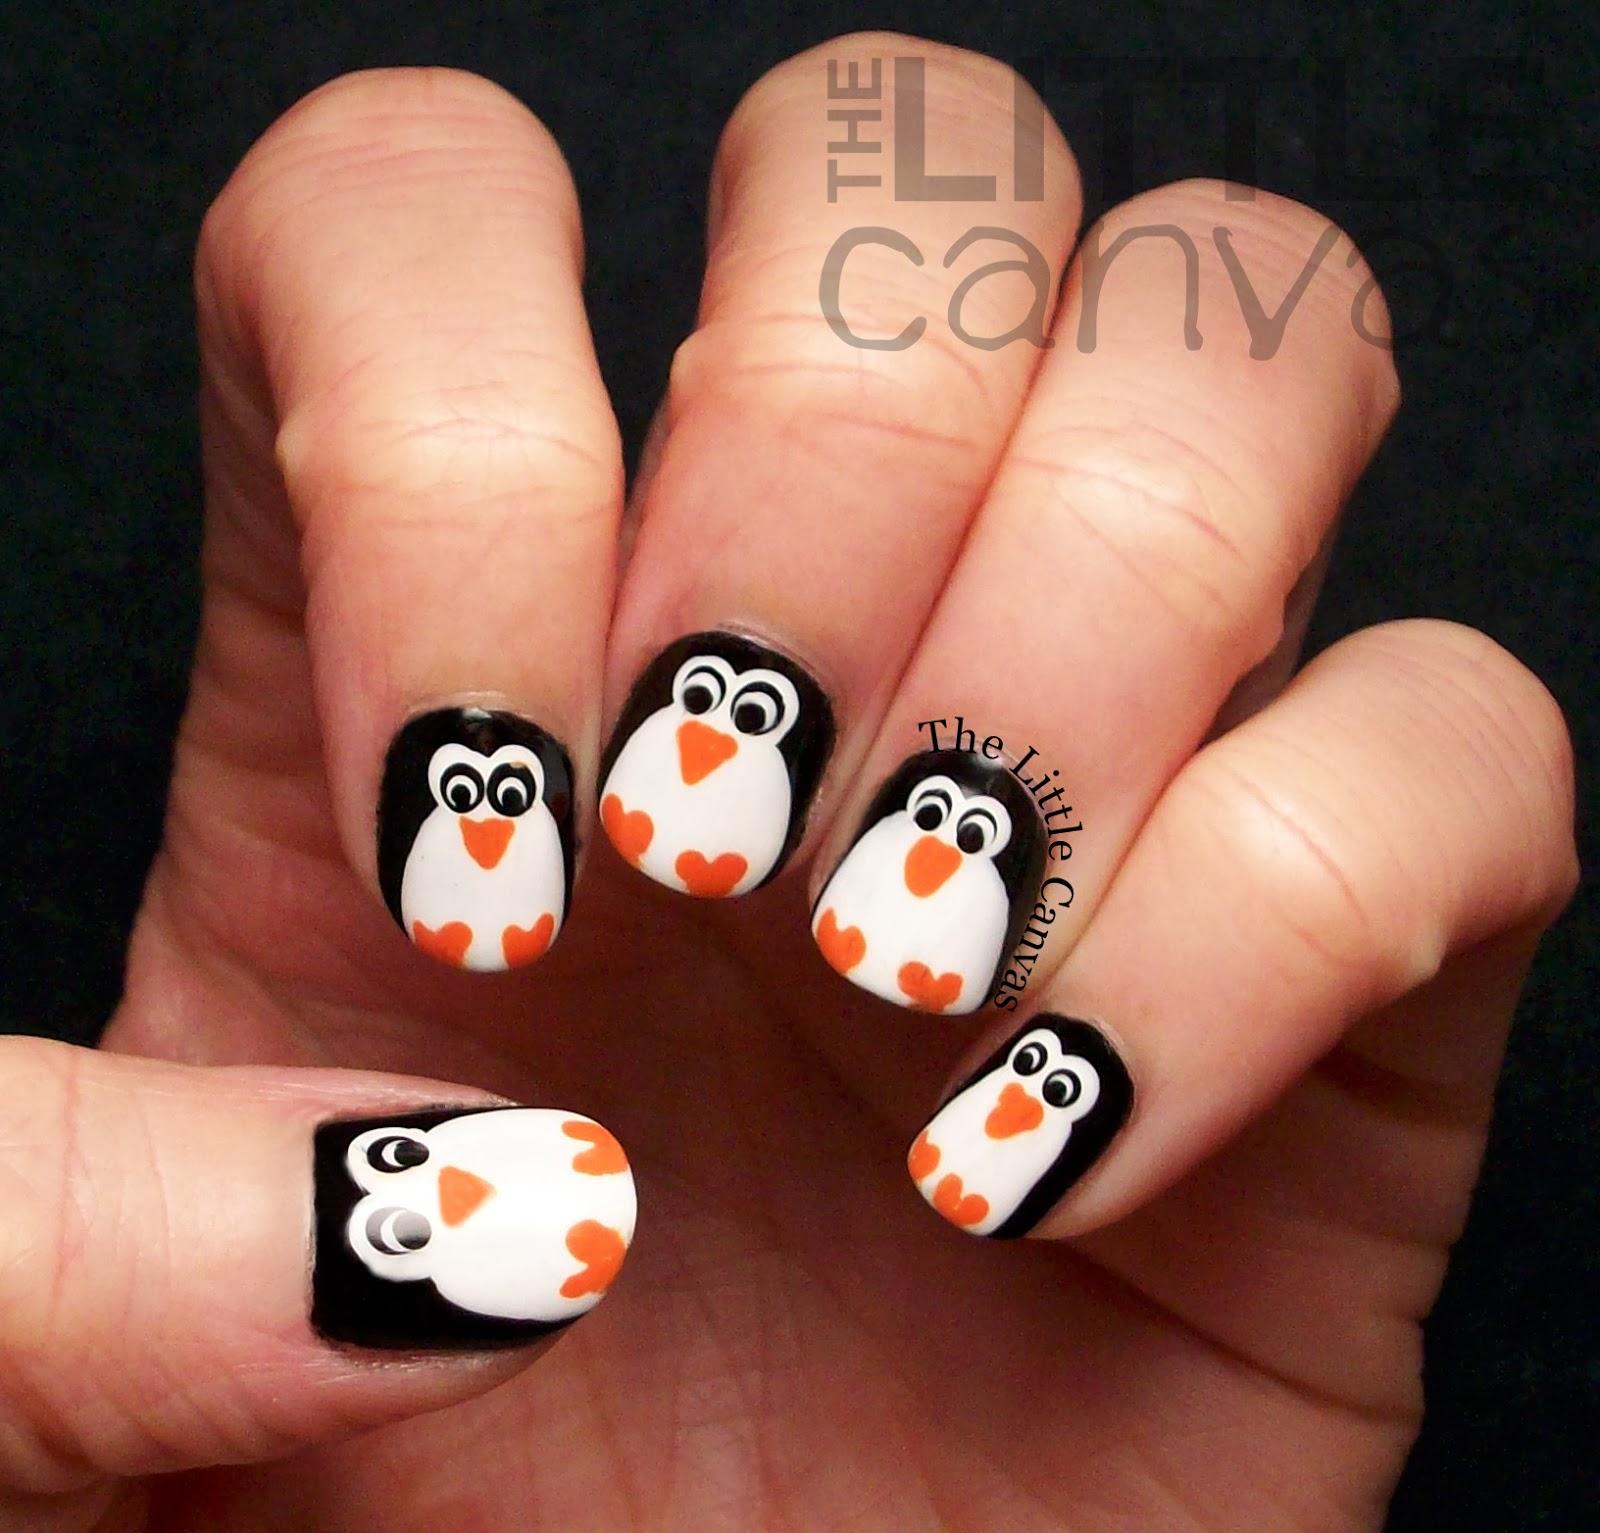 Penguin Nail Art - The Little Canvas